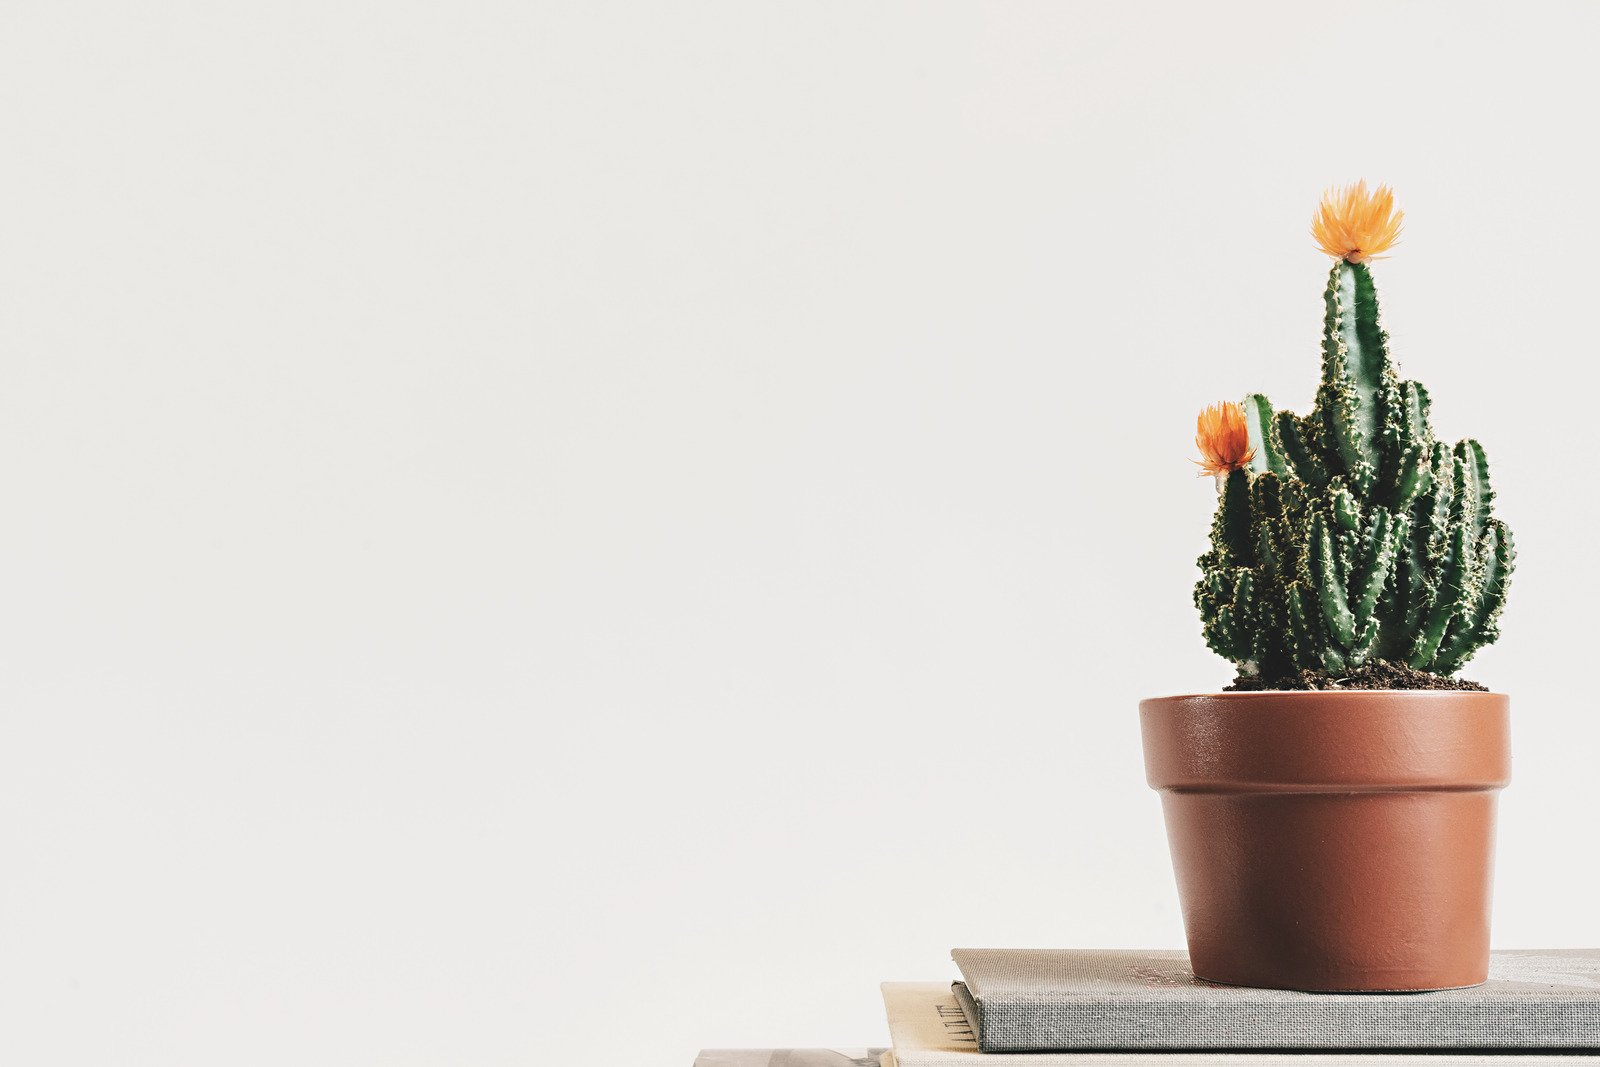 Green Cactus Plant on Pot